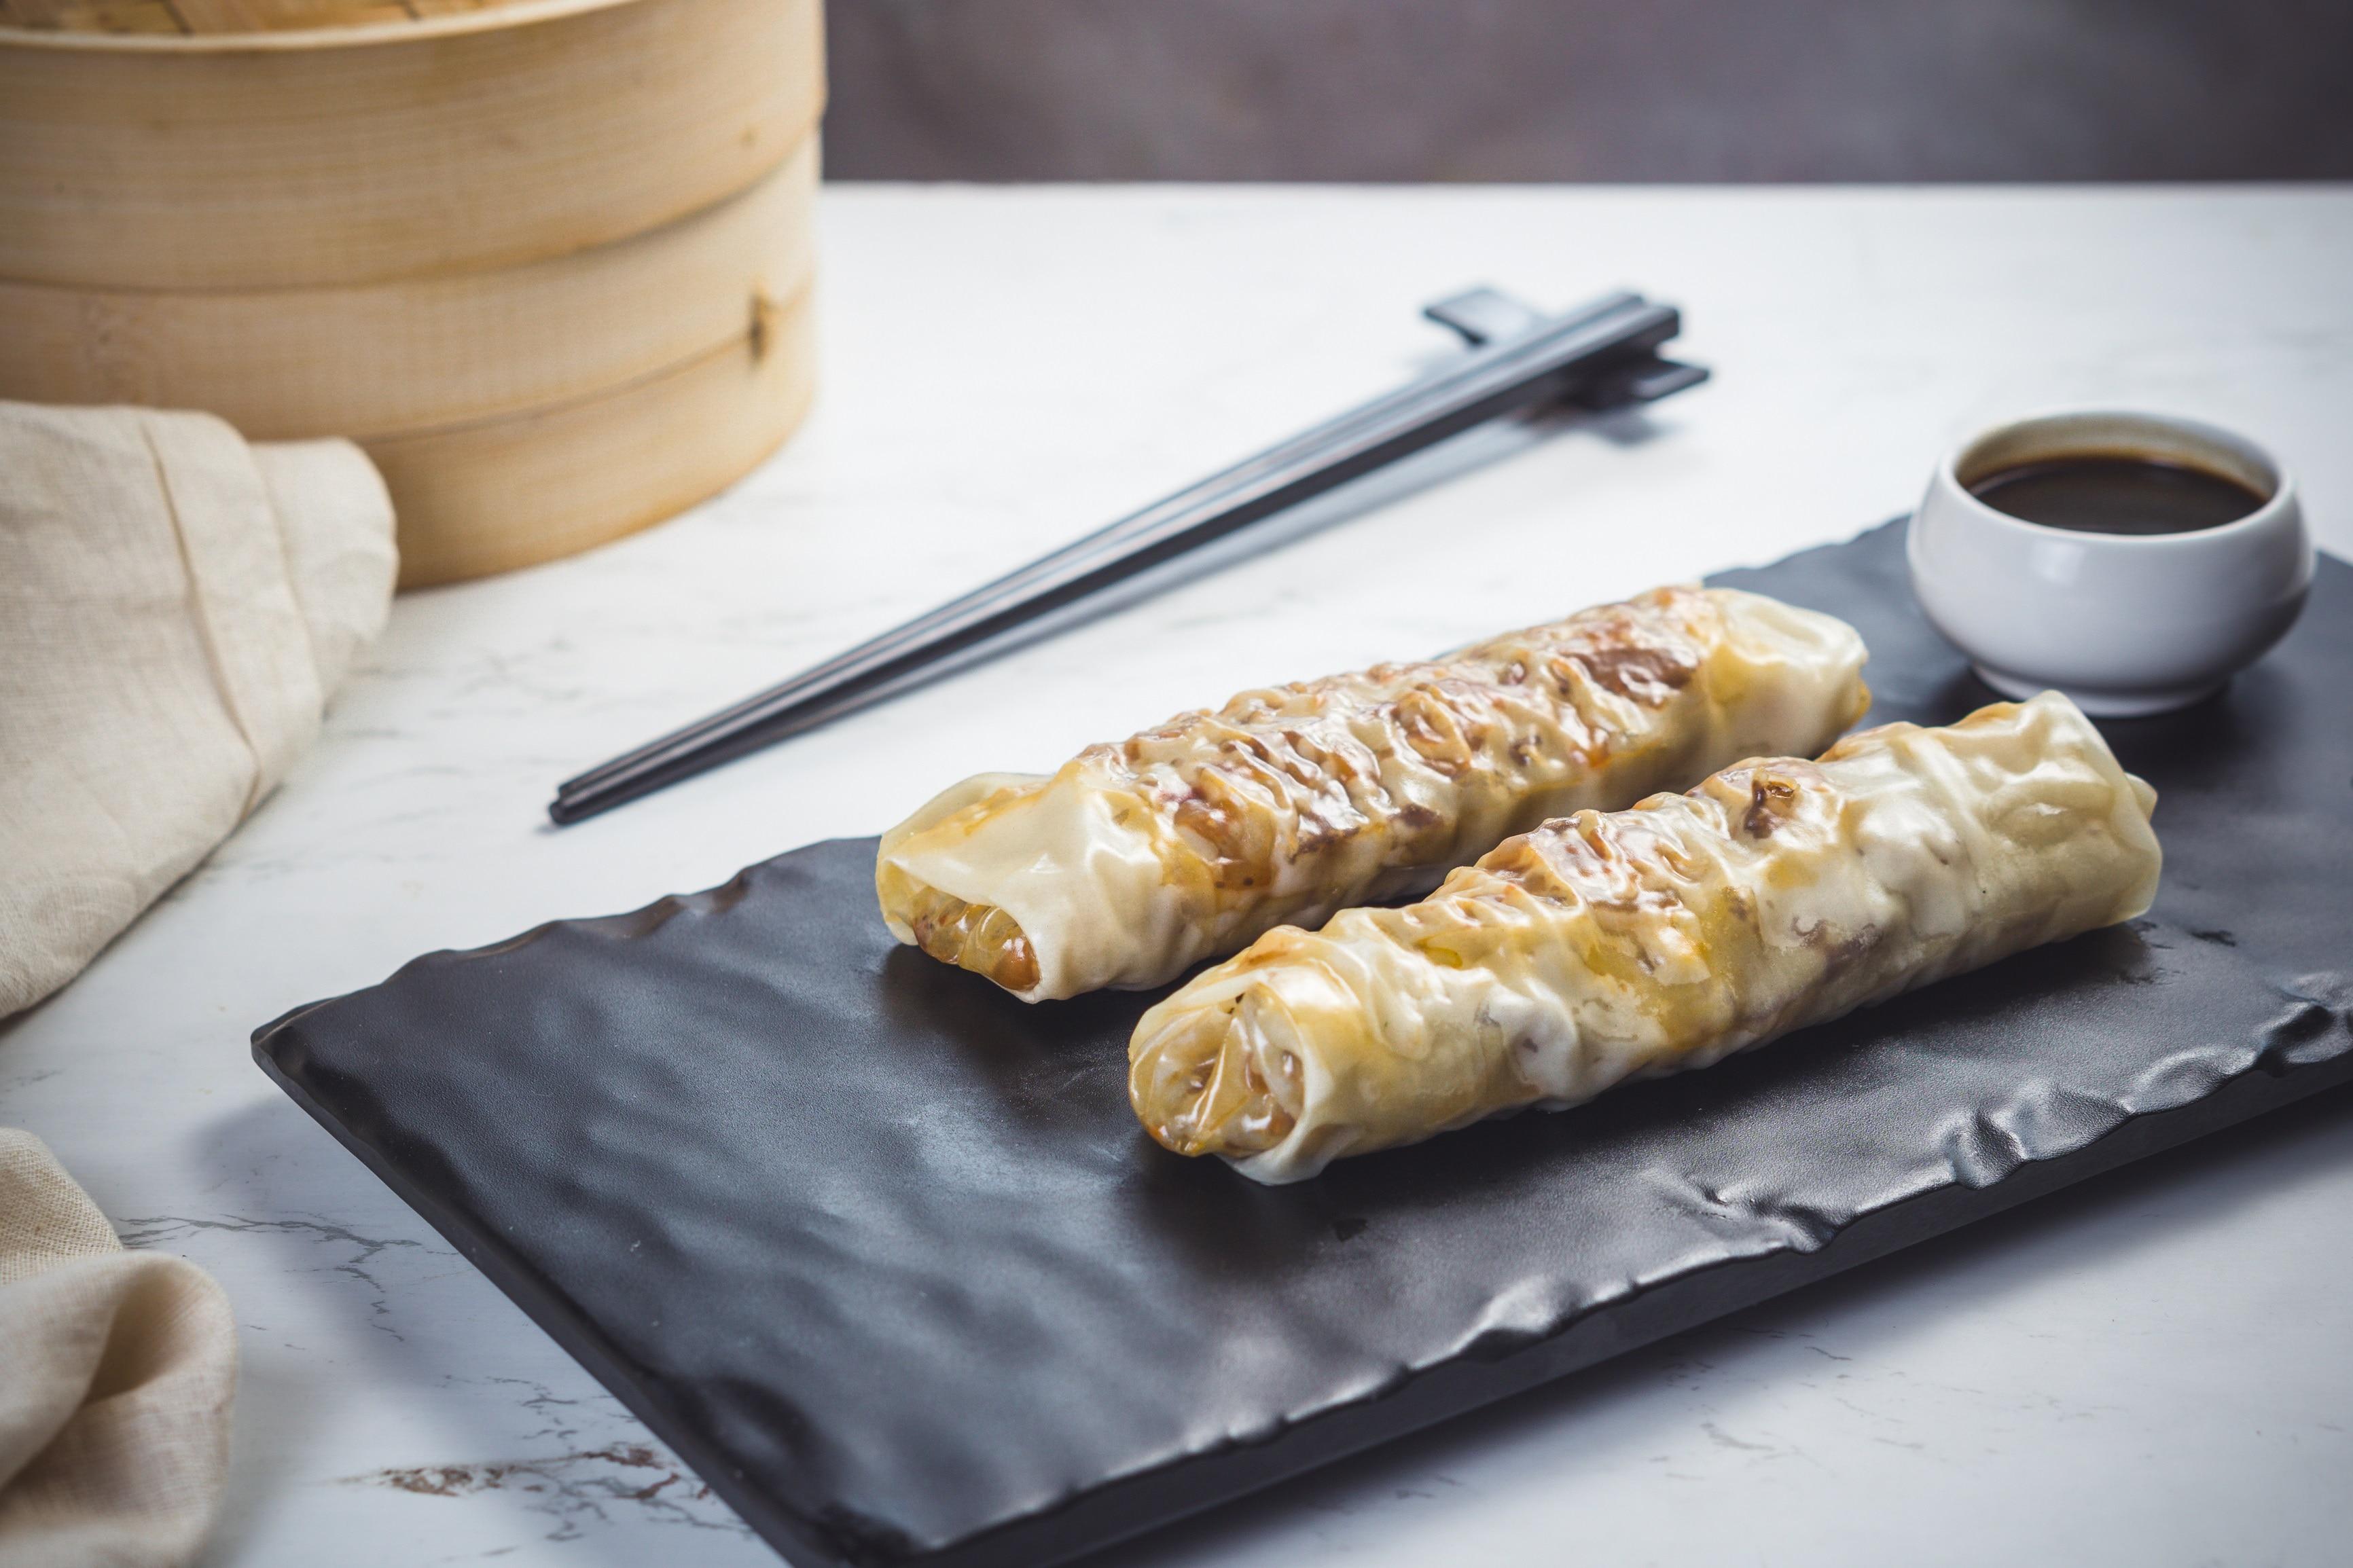 Lamb rolls in soya sauce(Chowman)